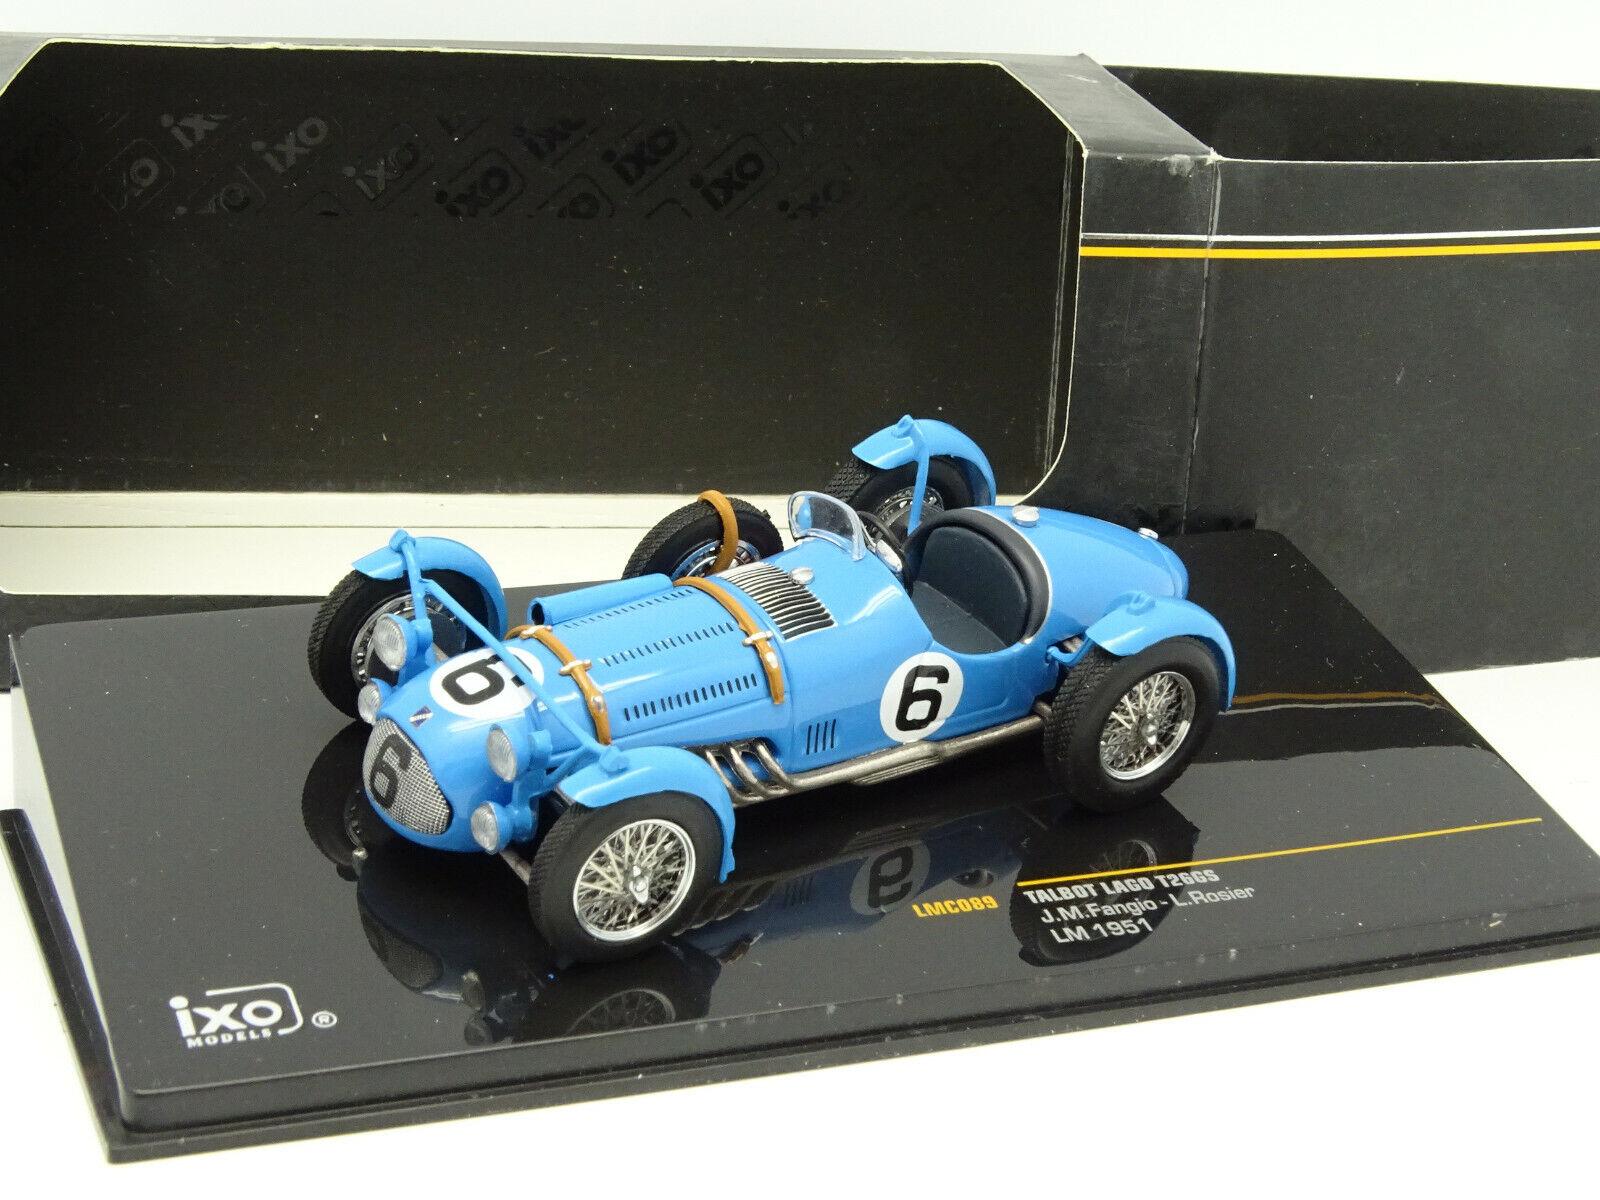 IXO 1 43 - Talbot Lago t26gs Fangio mans 1951 N 6